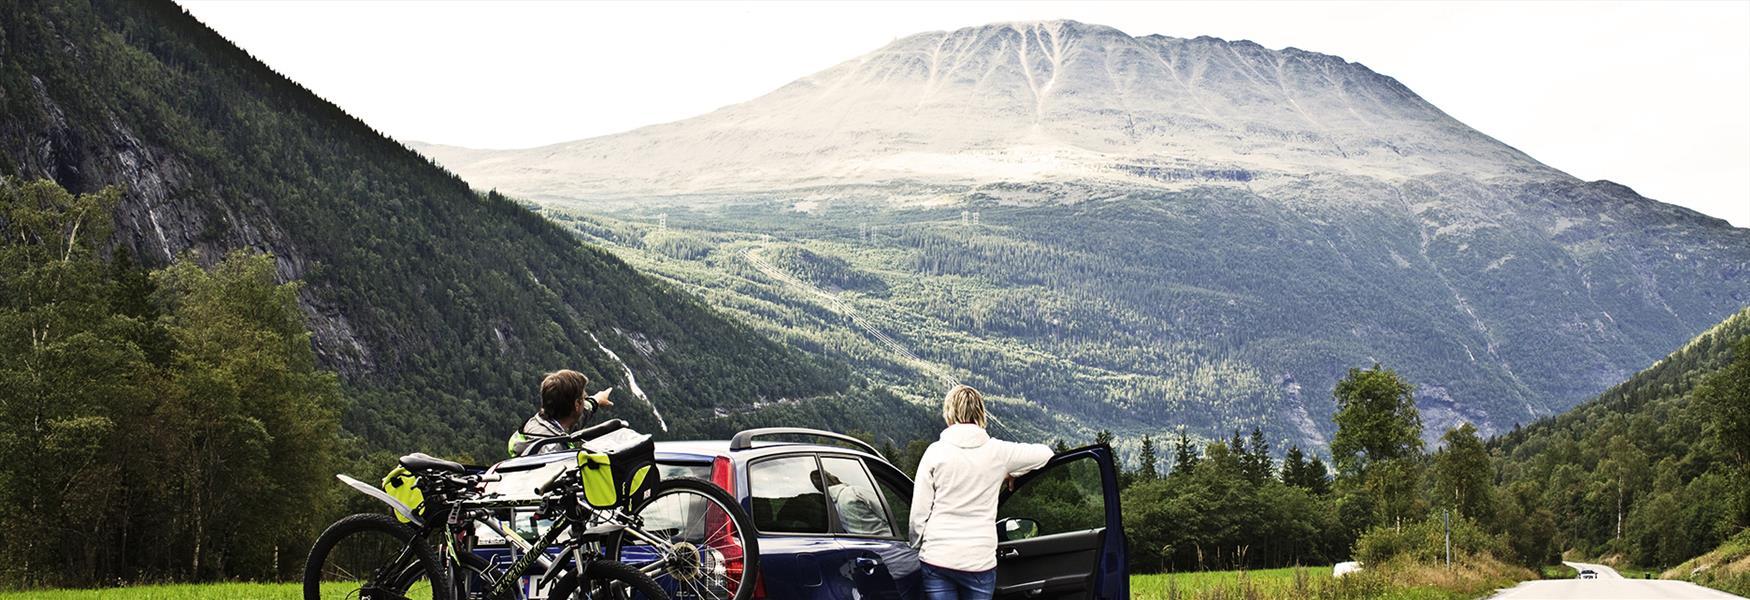 Bilferie til Hardangervidda